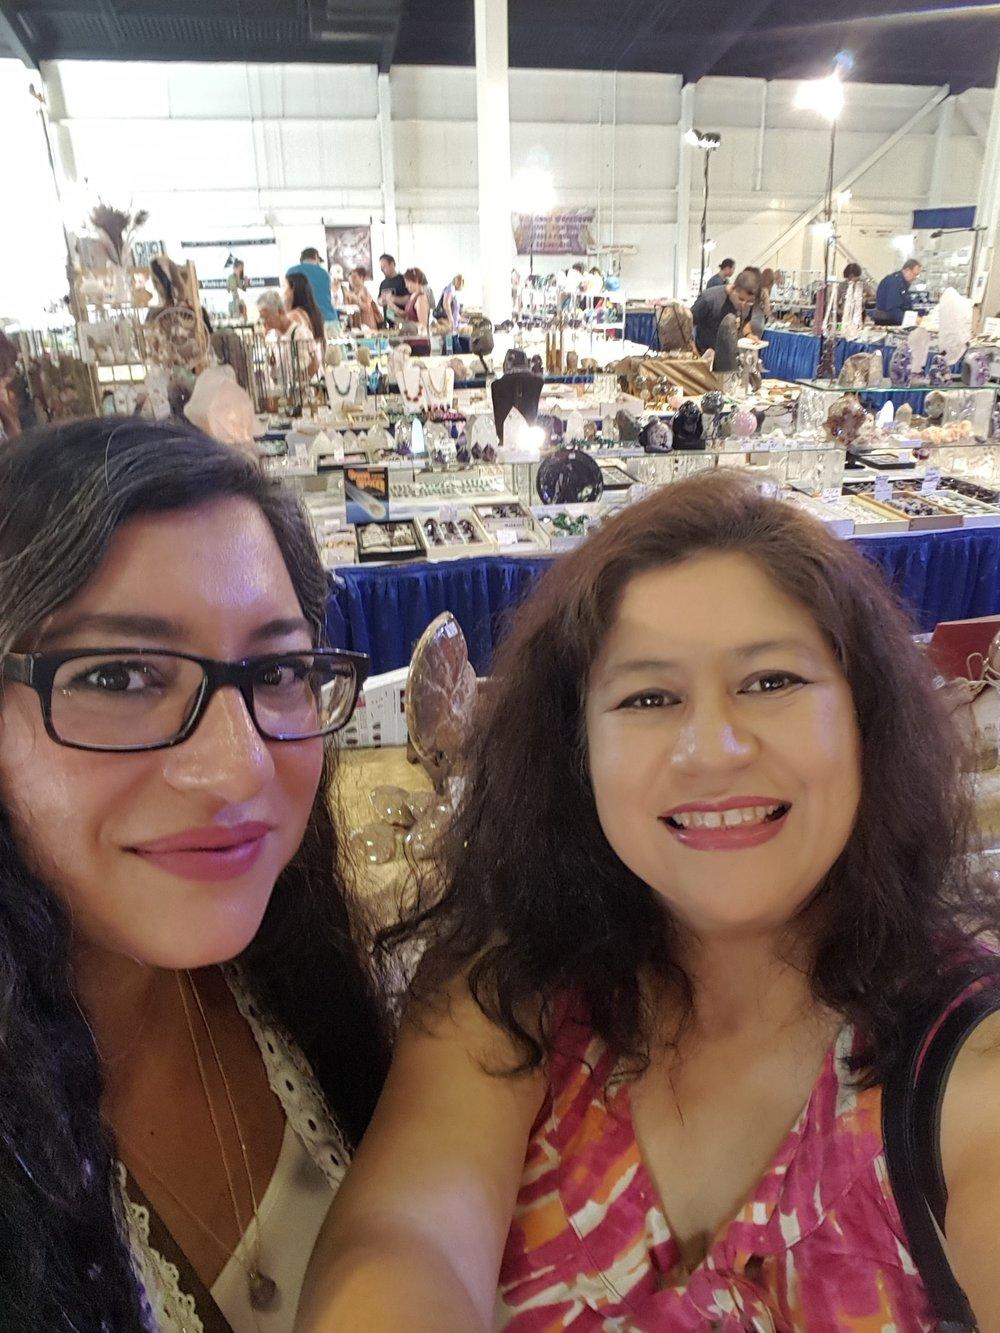 Costa Mesa show